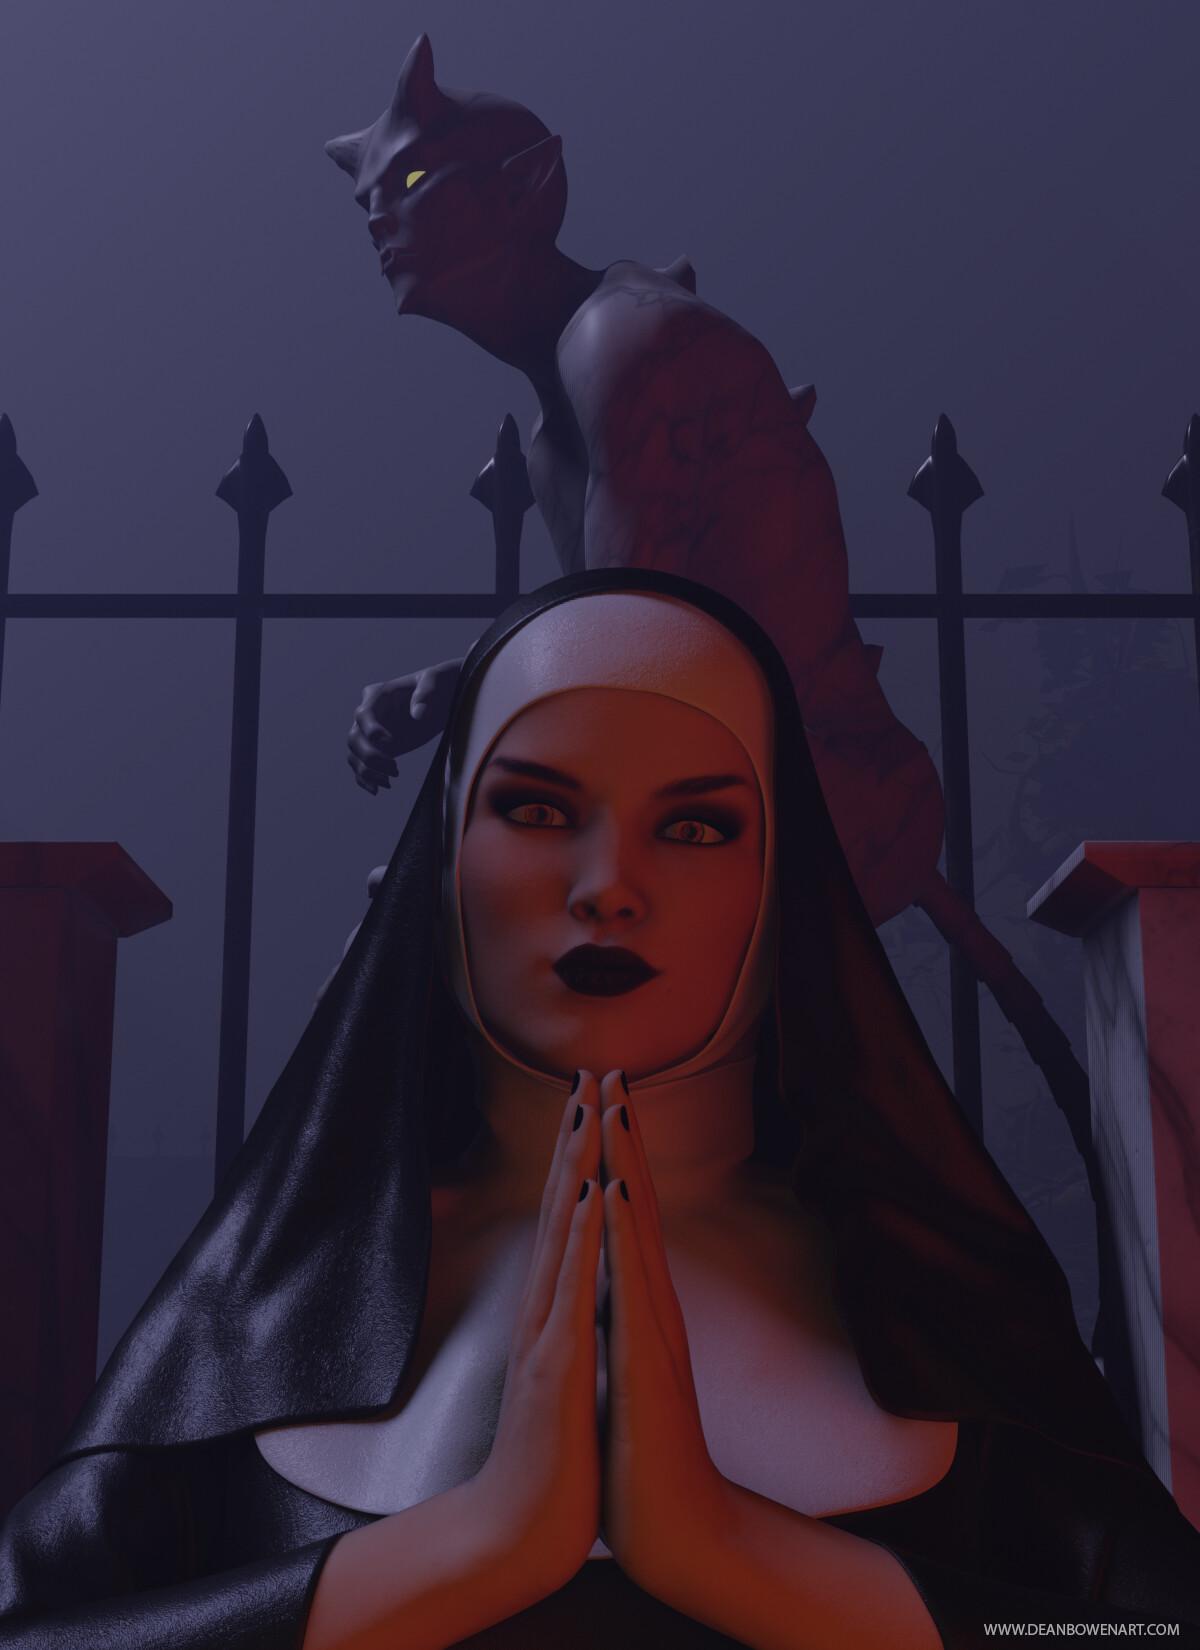 Dean bowen possessed nun by dean bowen